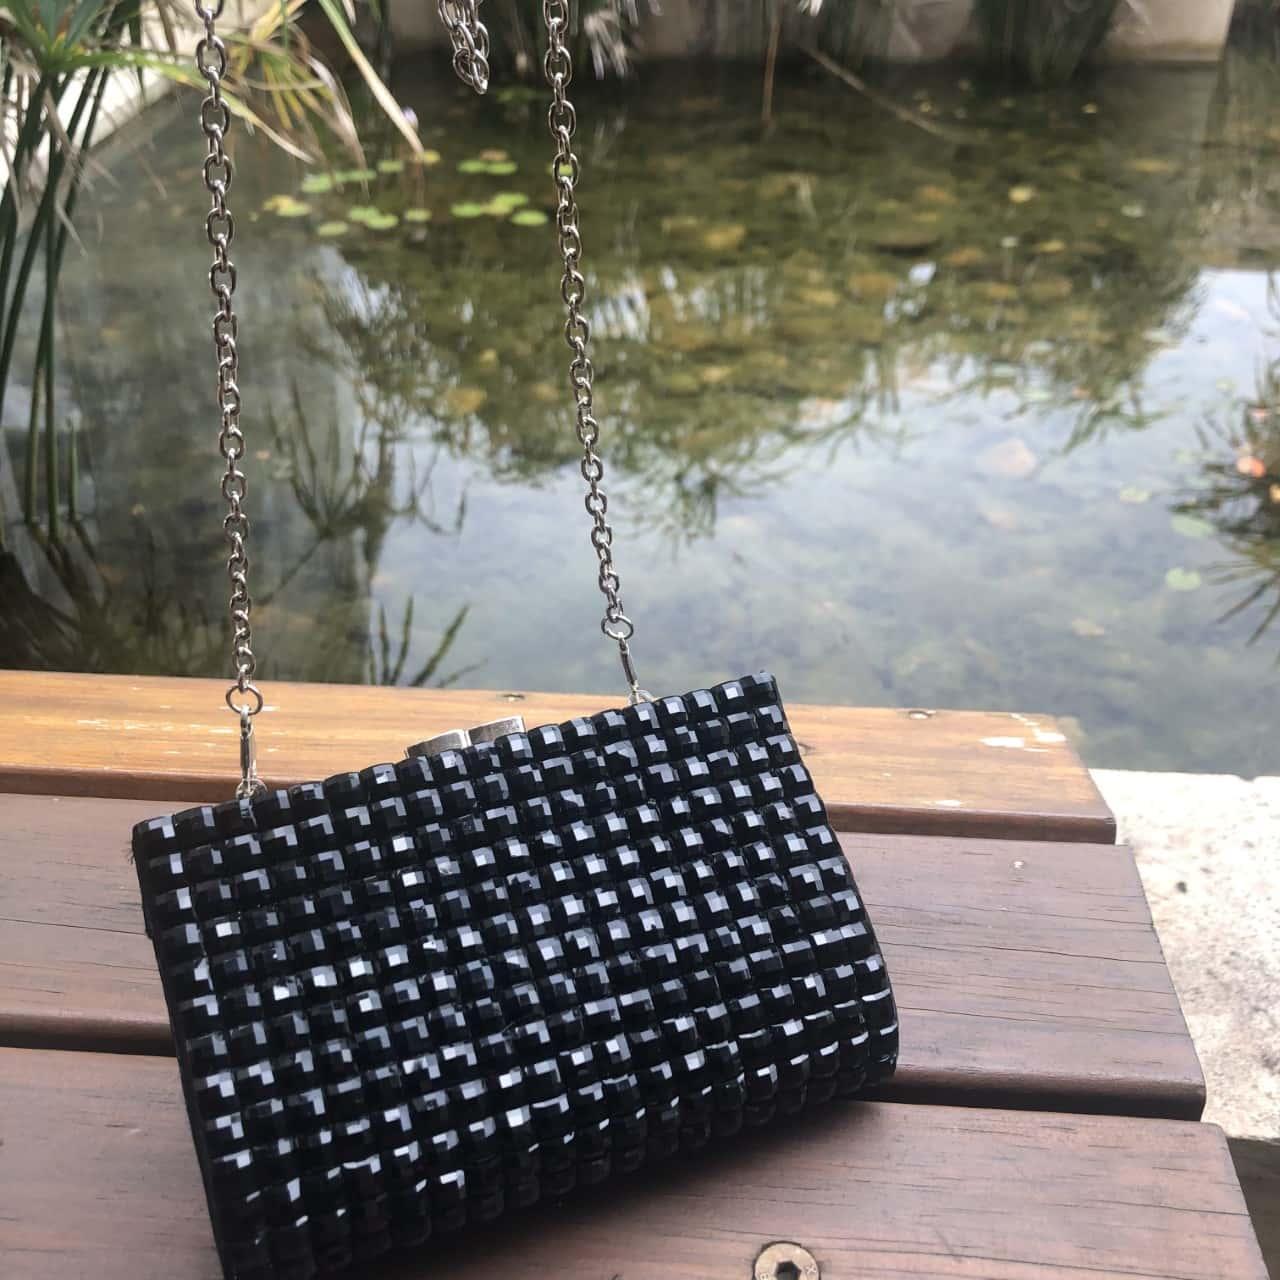 Kookai Black Sparkle Clutch